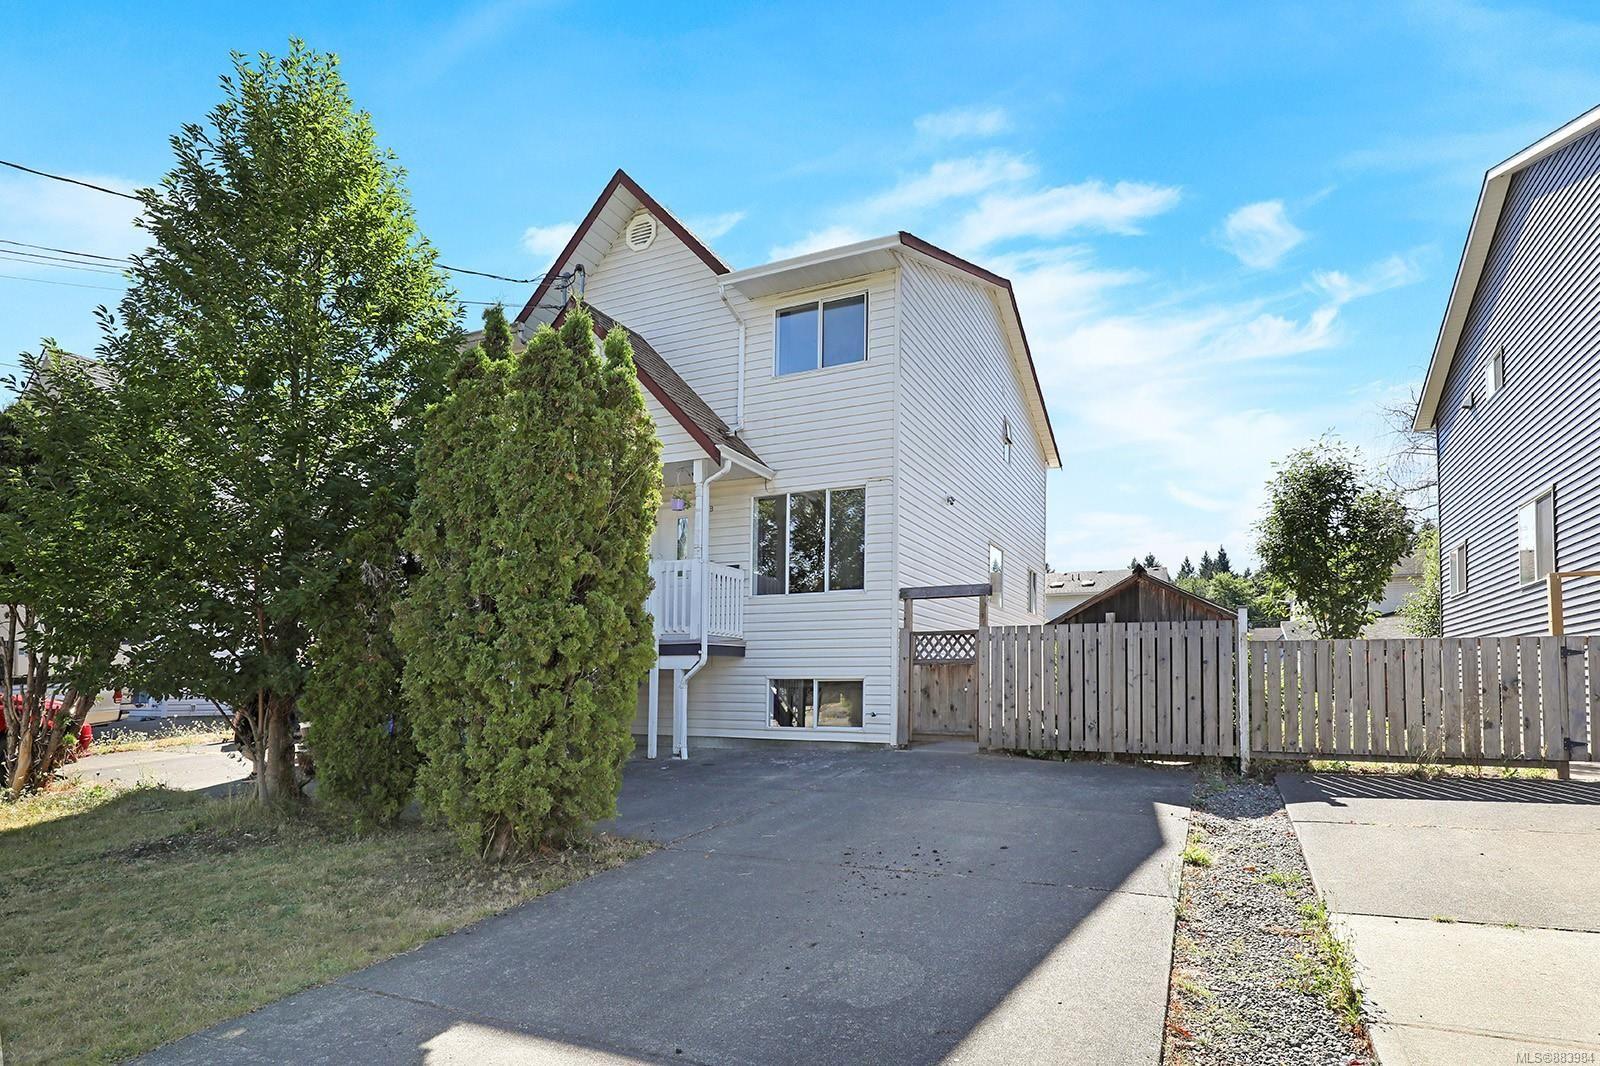 Main Photo: B 2052 1st St in : CV Courtenay City Half Duplex for sale (Comox Valley)  : MLS®# 883984